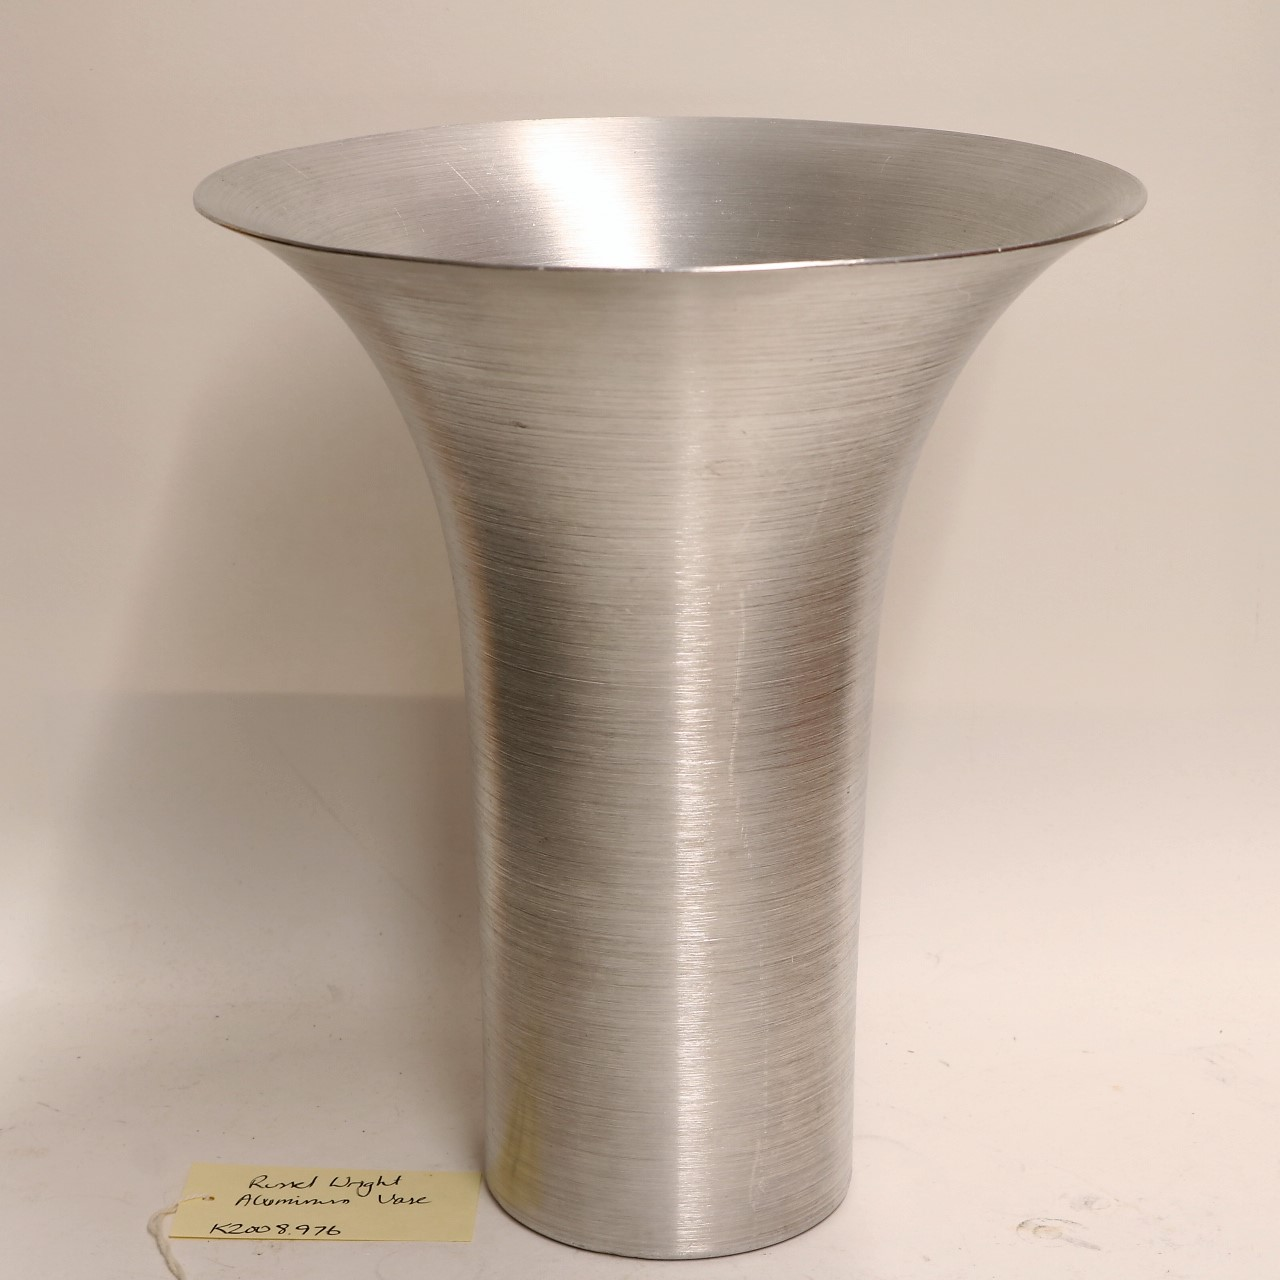 Spun Aluminum Large Vase, 1933